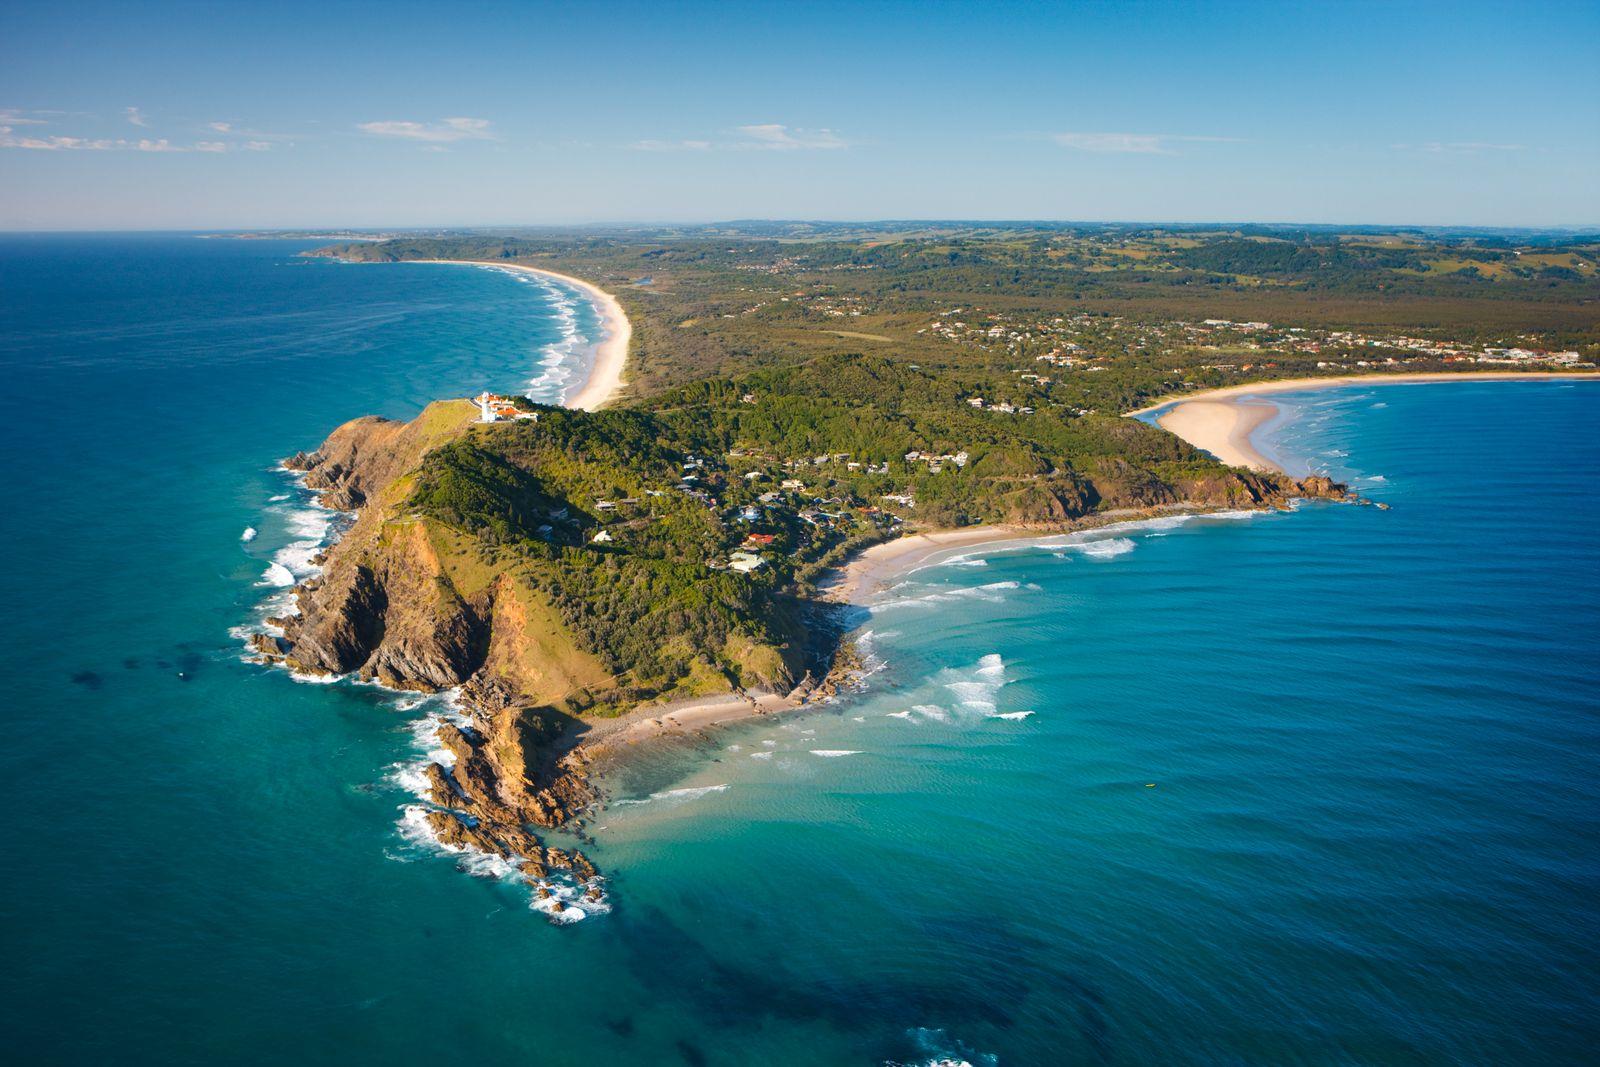 Byron Bay Aerial View